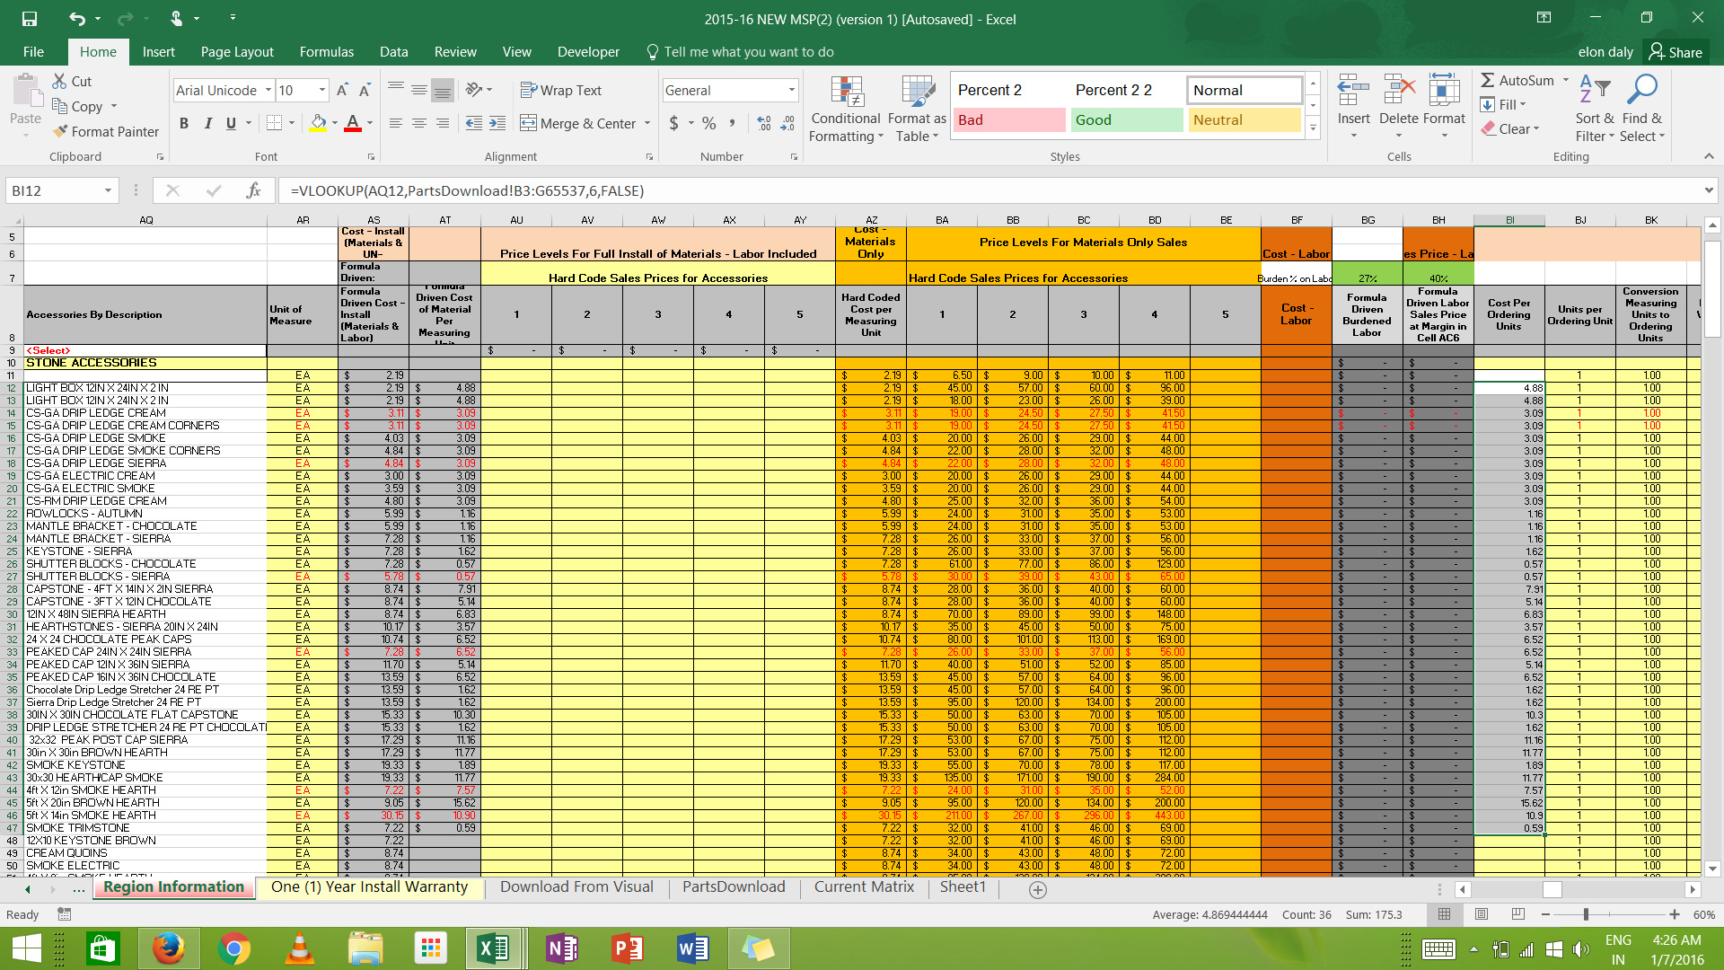 Formula 1 Excel Spreadsheet Pertaining To Formula 1 Excel Spreadsheet – Spreadsheet Collections